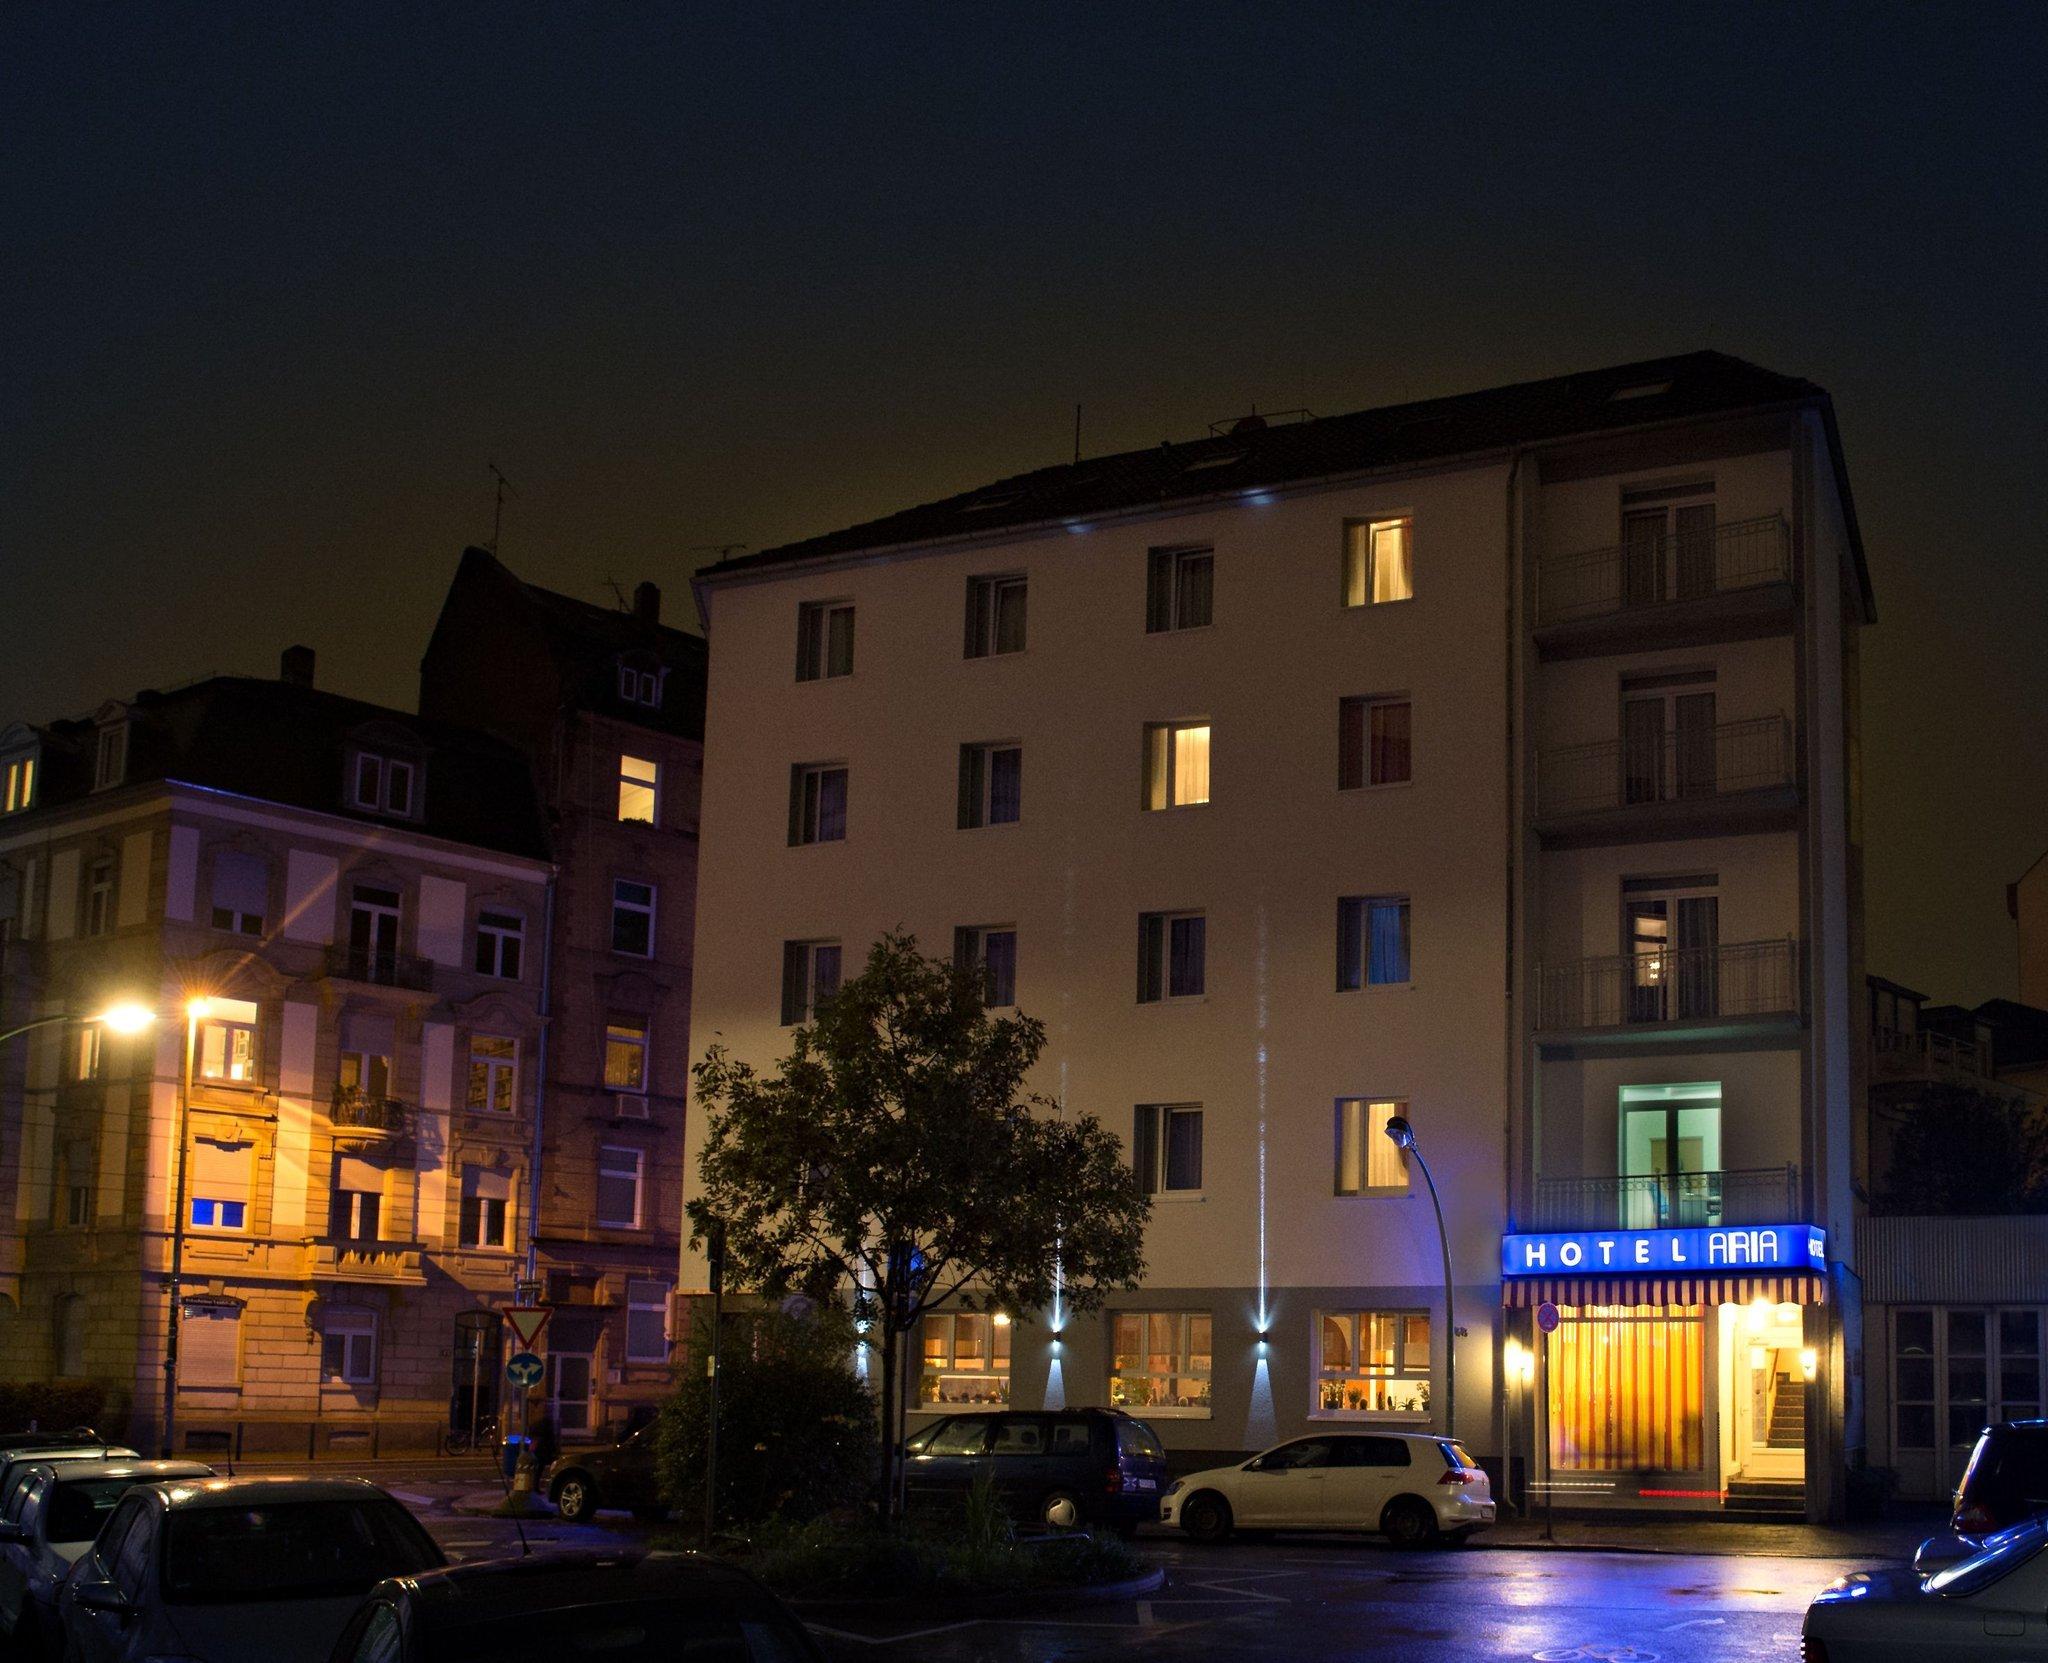 Select Hotel Aria